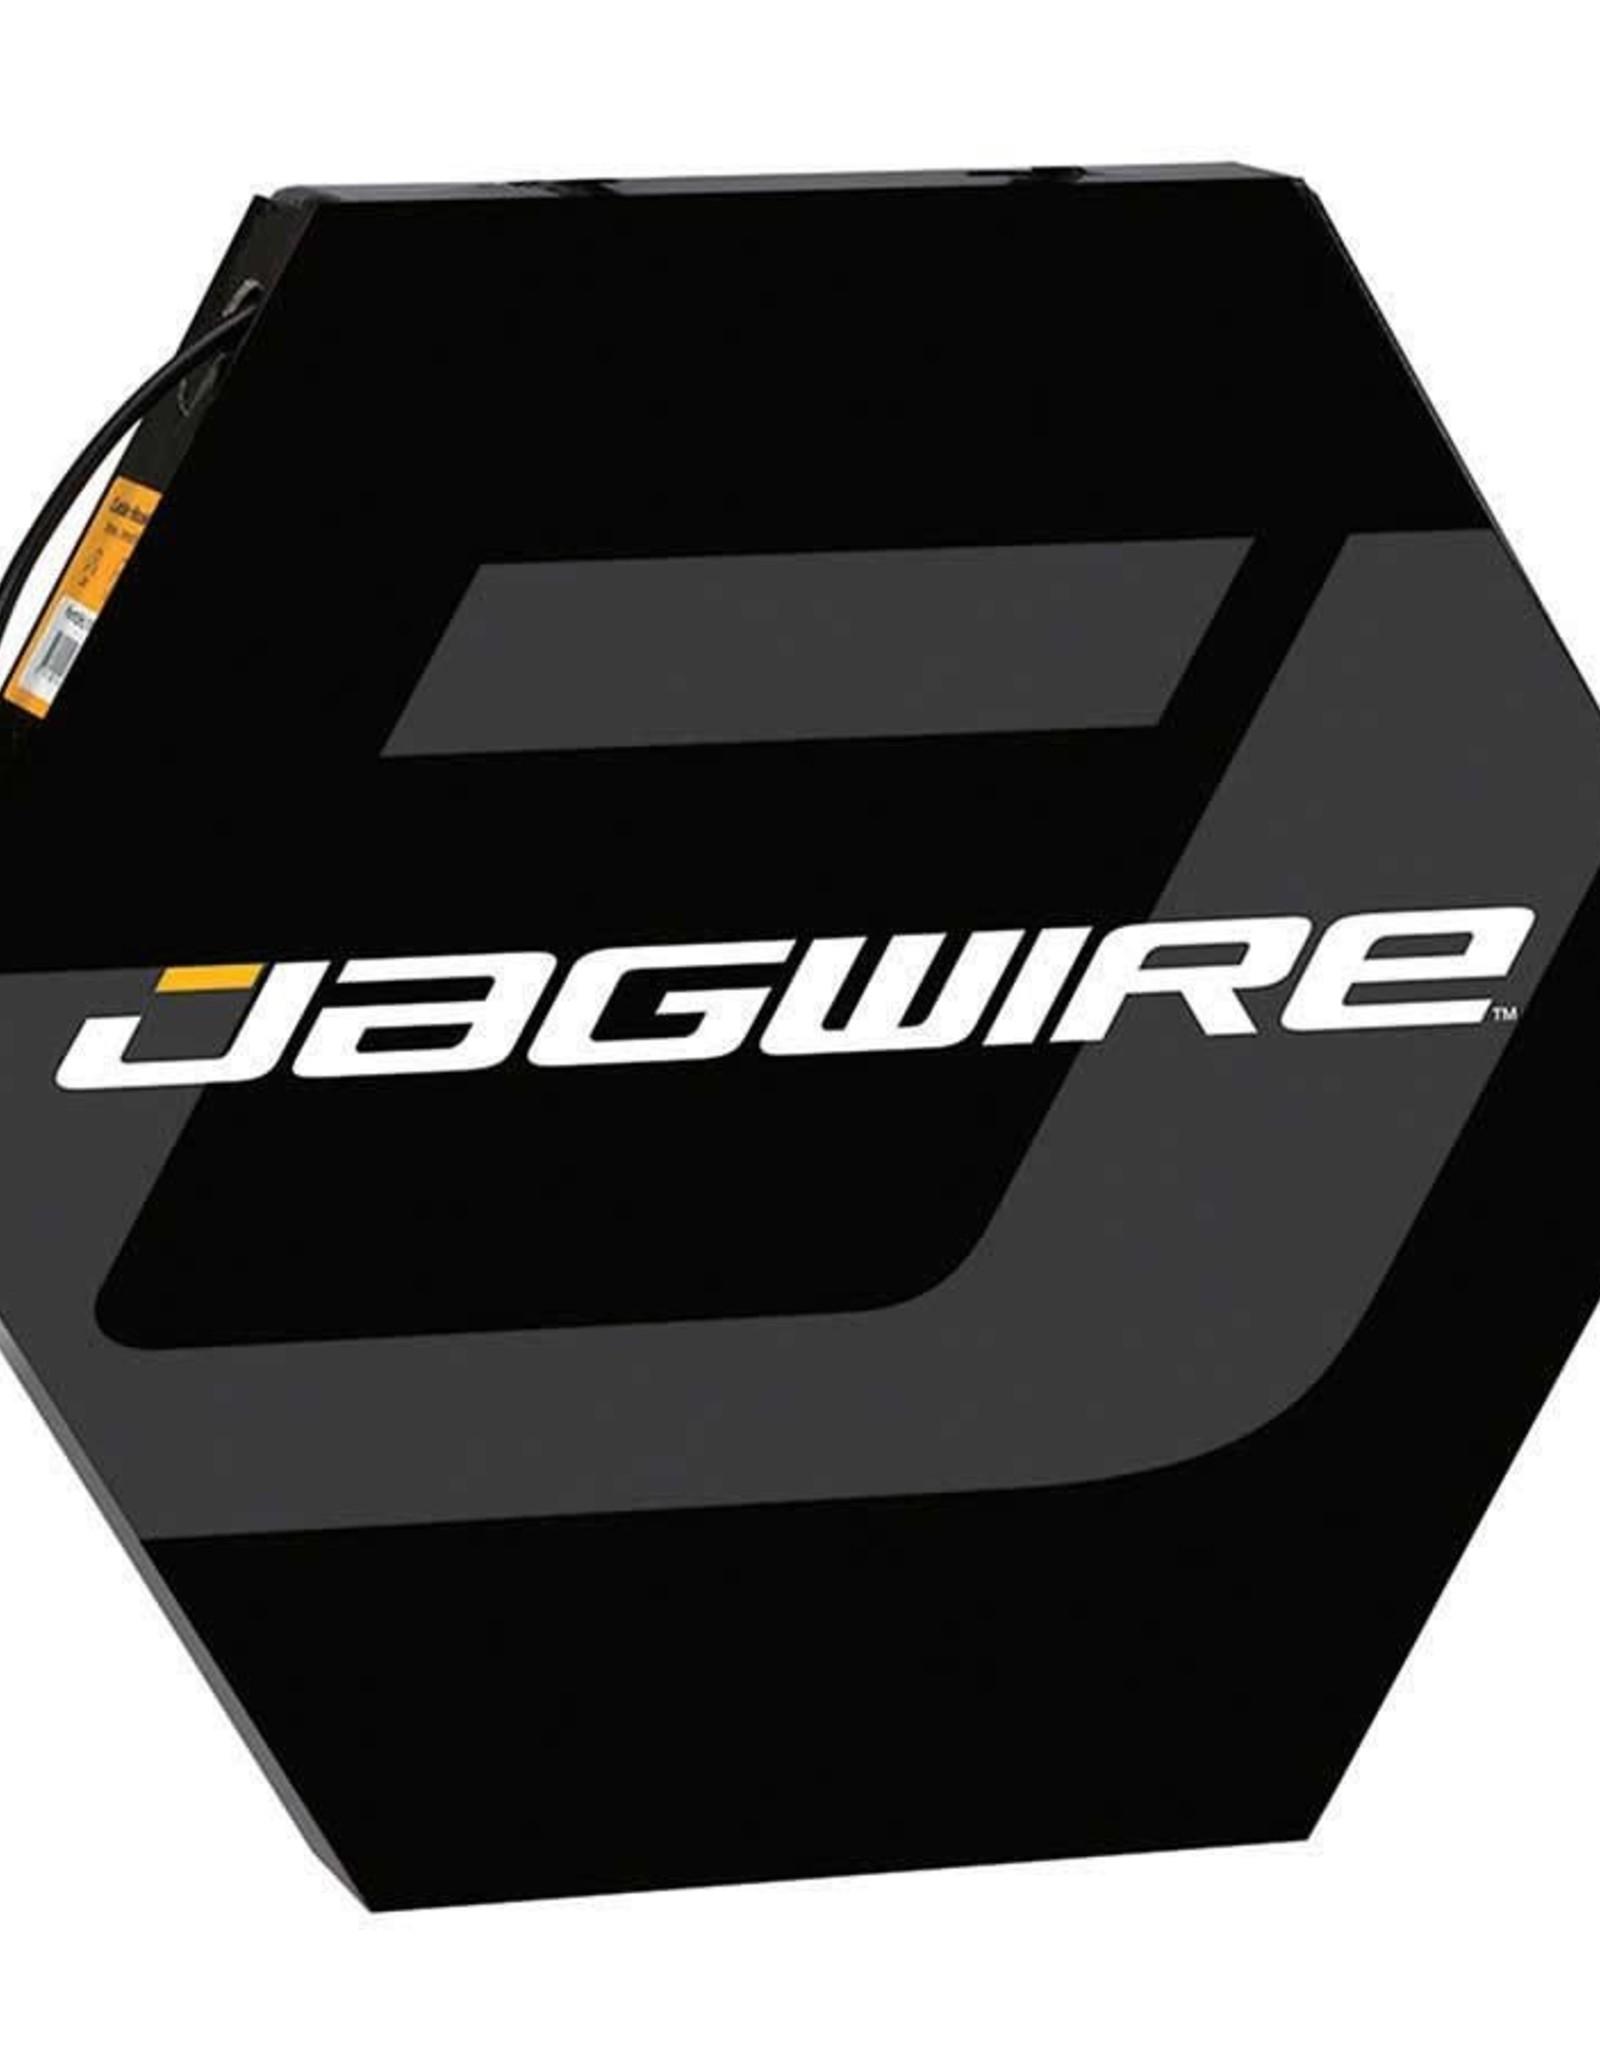 JAGWIRE jagwire LEX derrailleur housing 4mm black (per foot.)